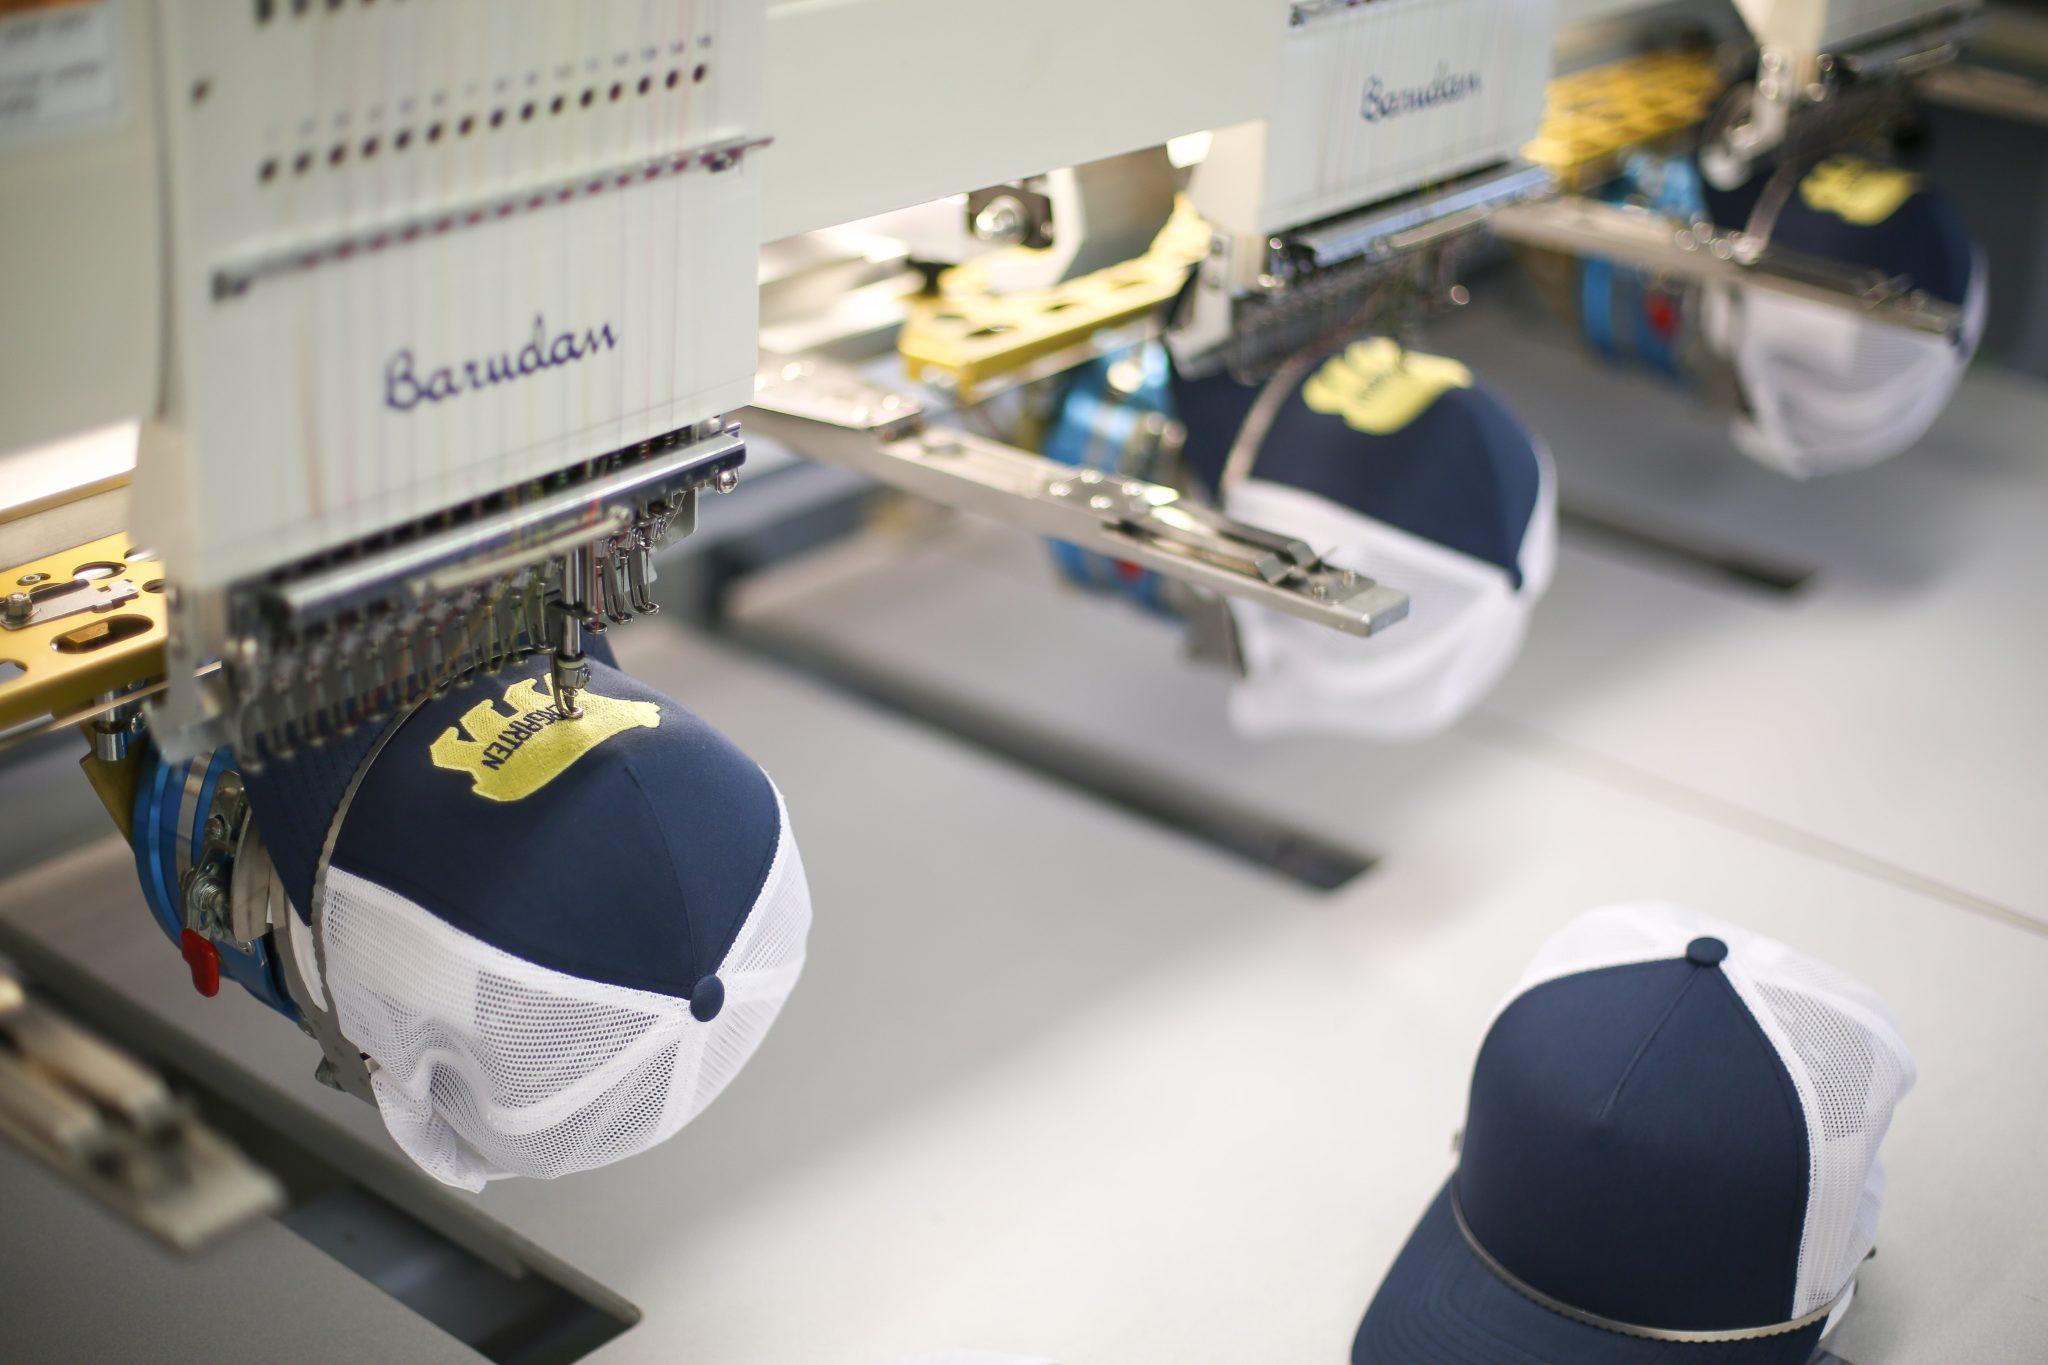 printing hats